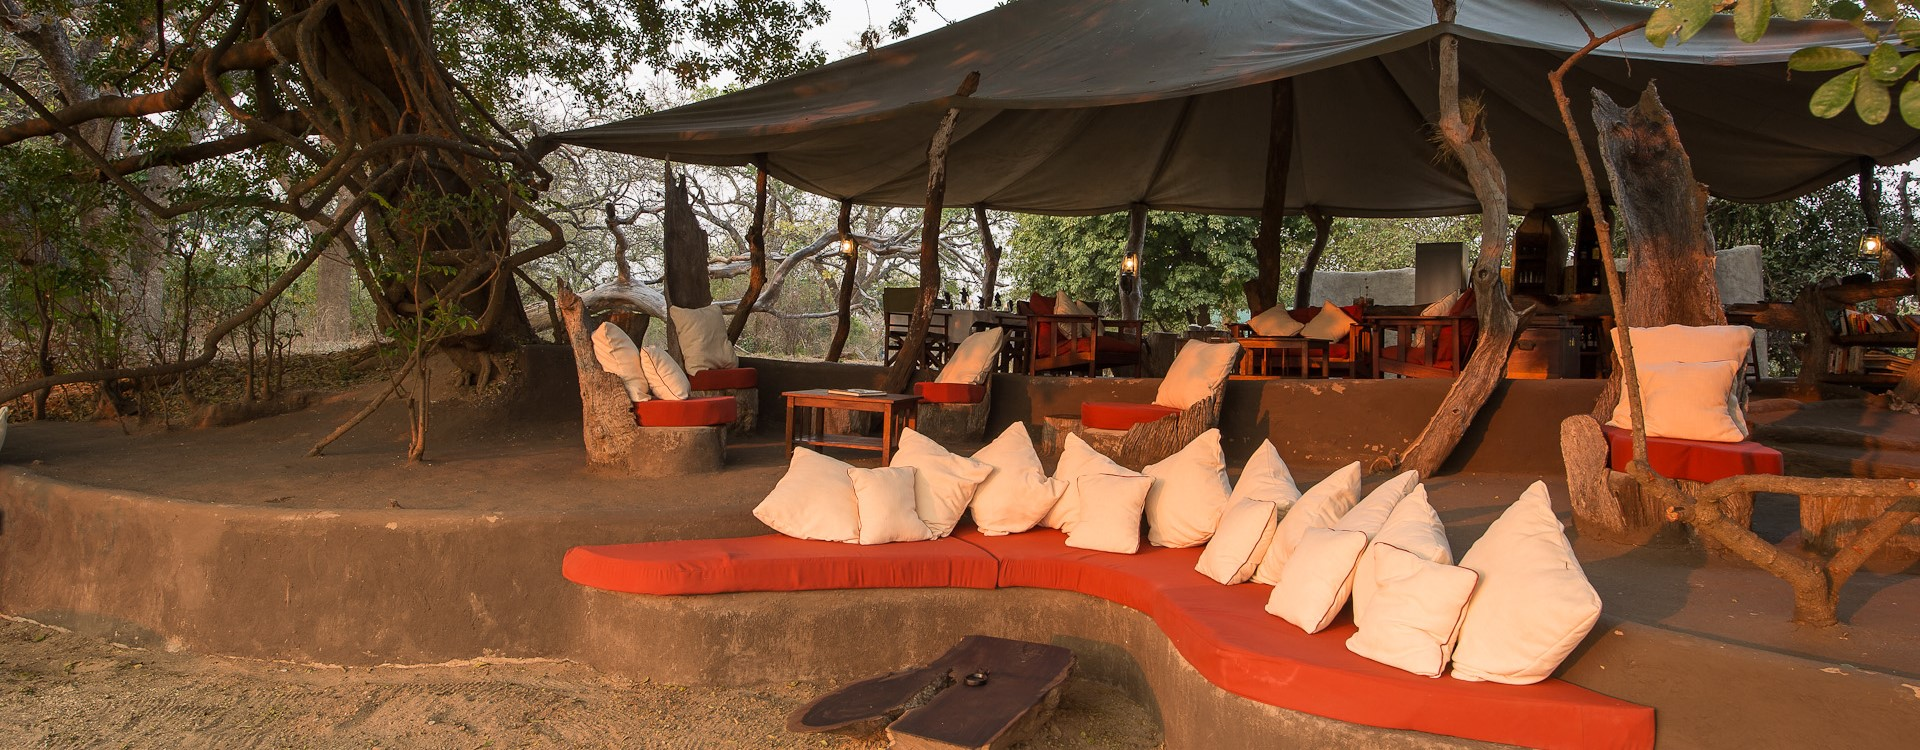 tena-tena-camp-dining-tent